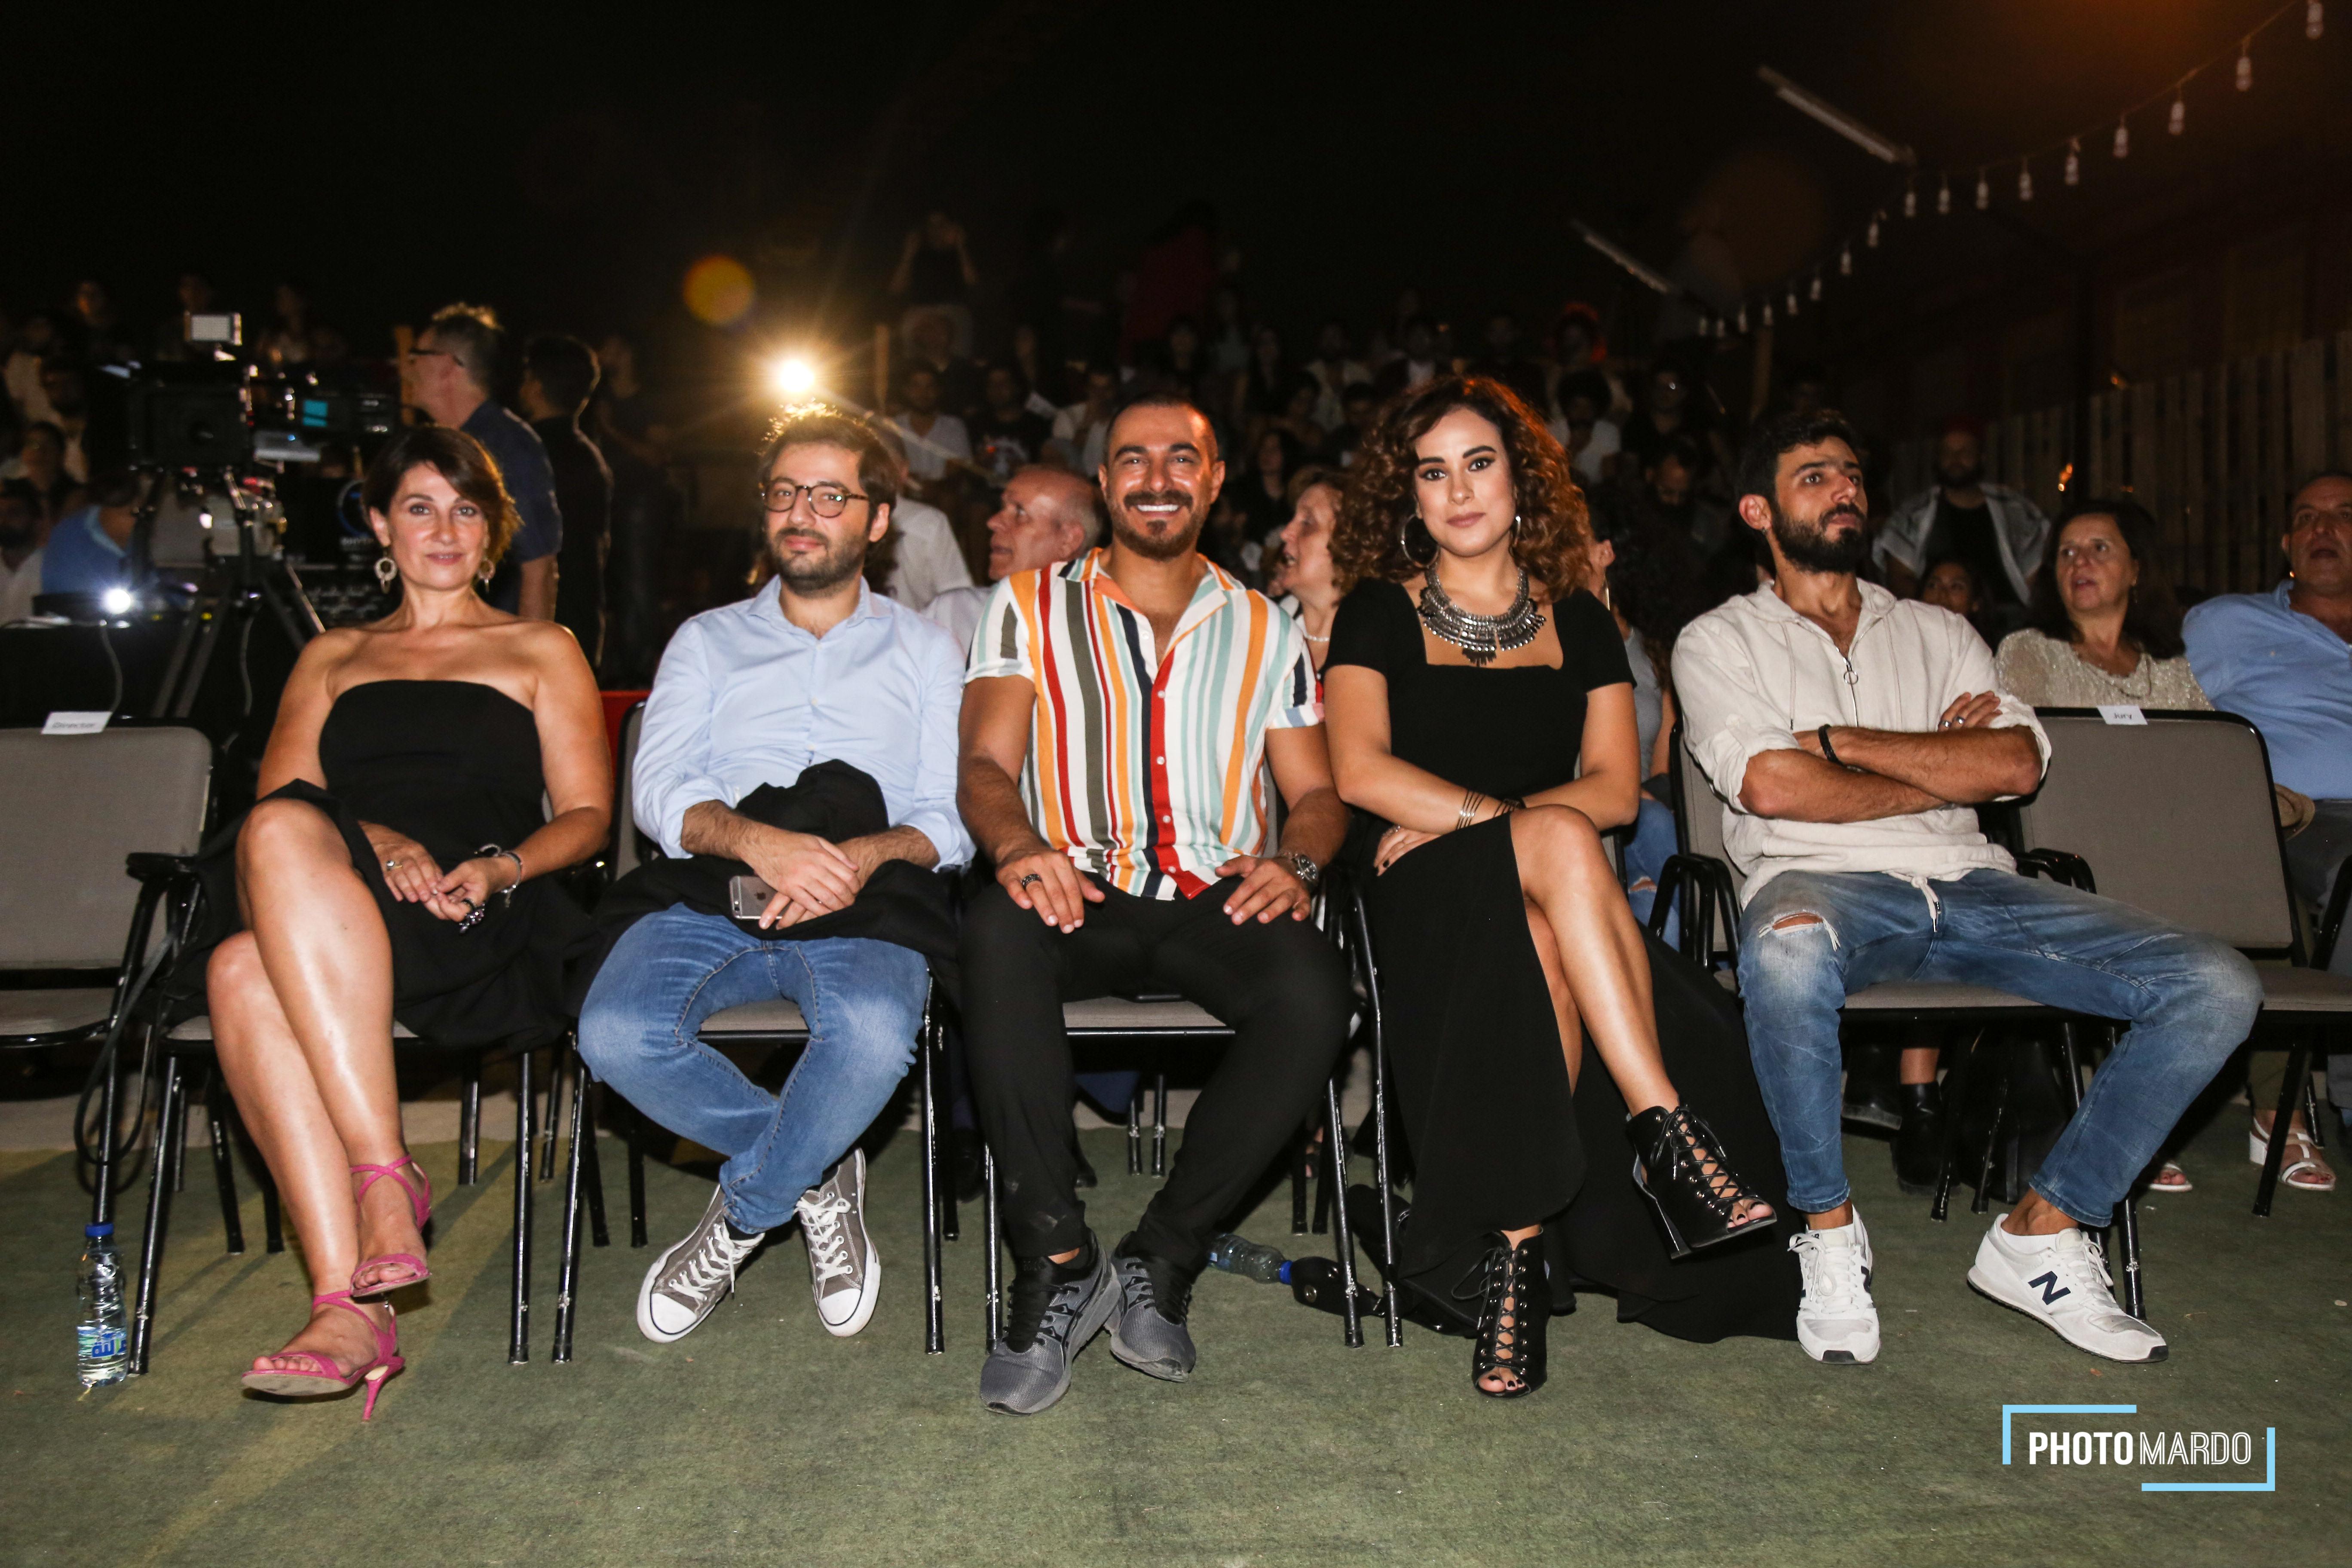 LIFF - Lebanese independent film festival LIFF - Lebanese independent film festival